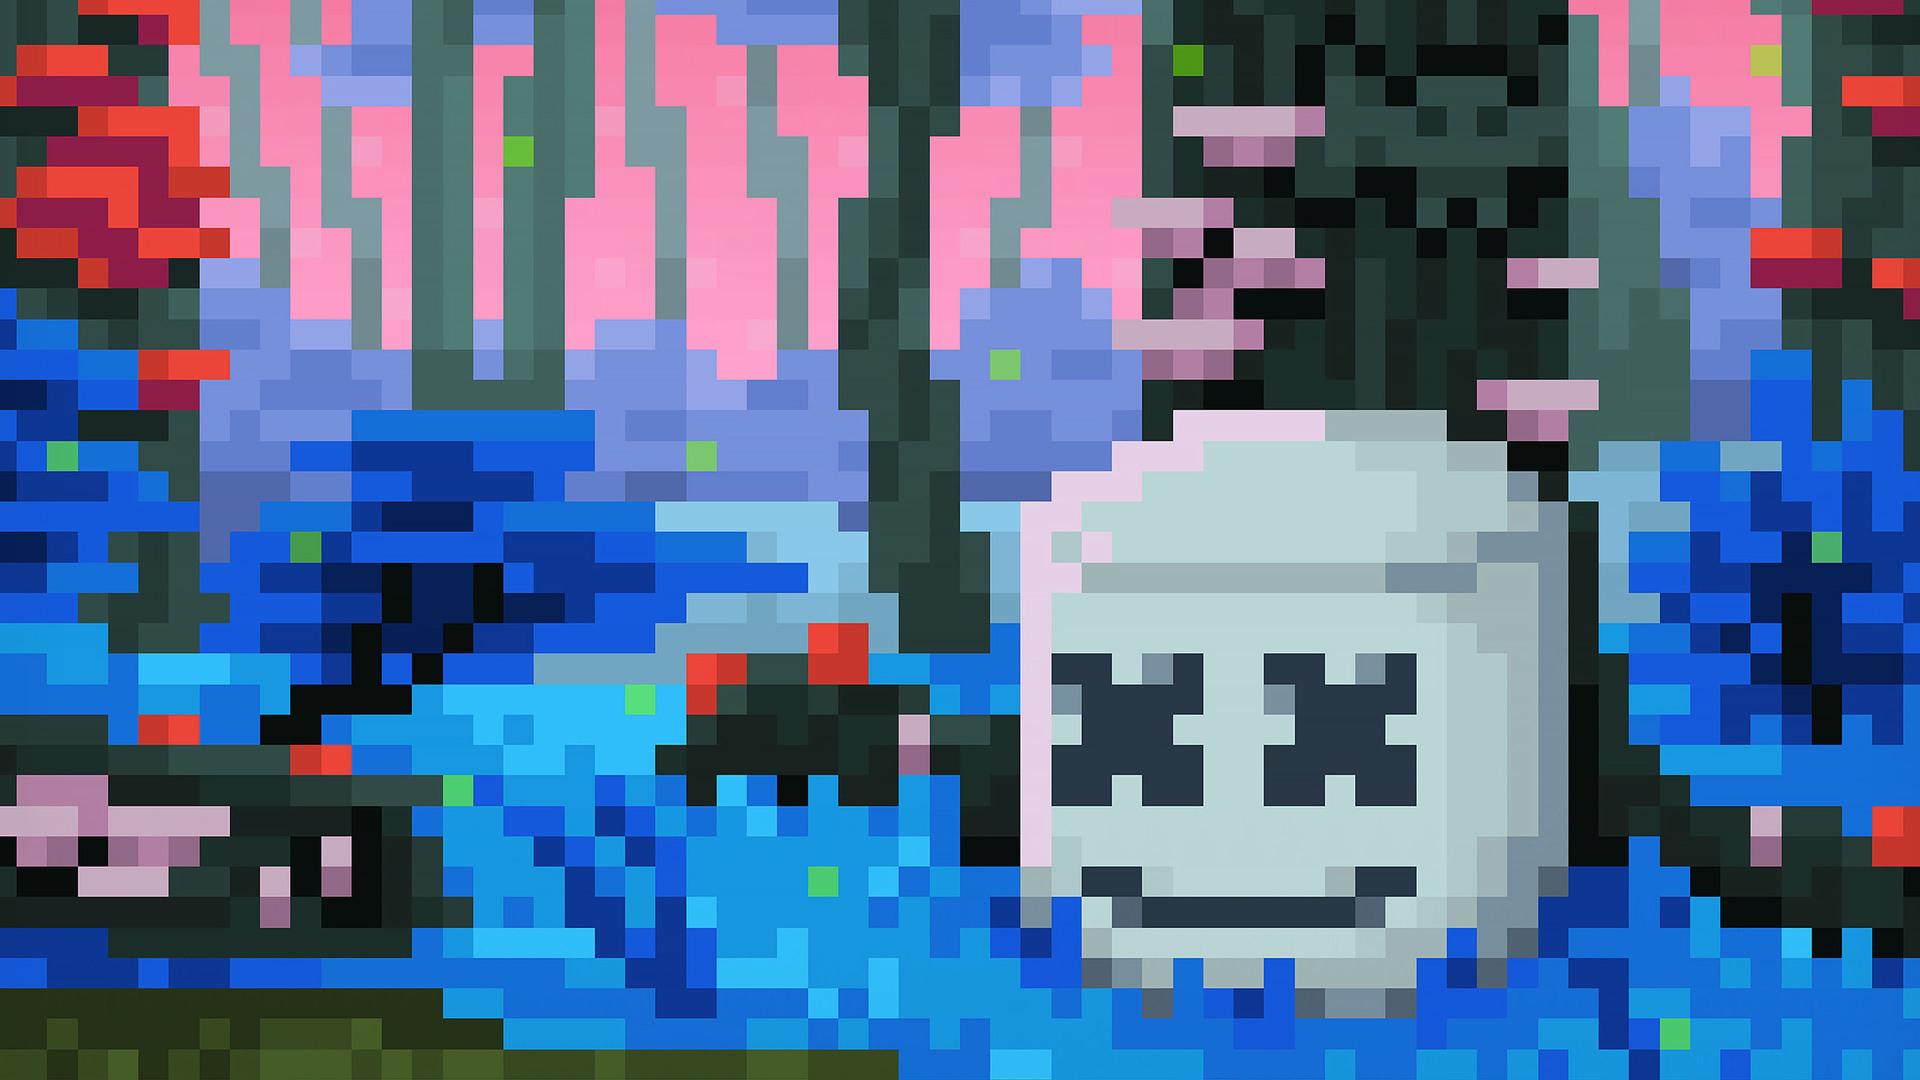 marshmello-8-bit-image.jpg